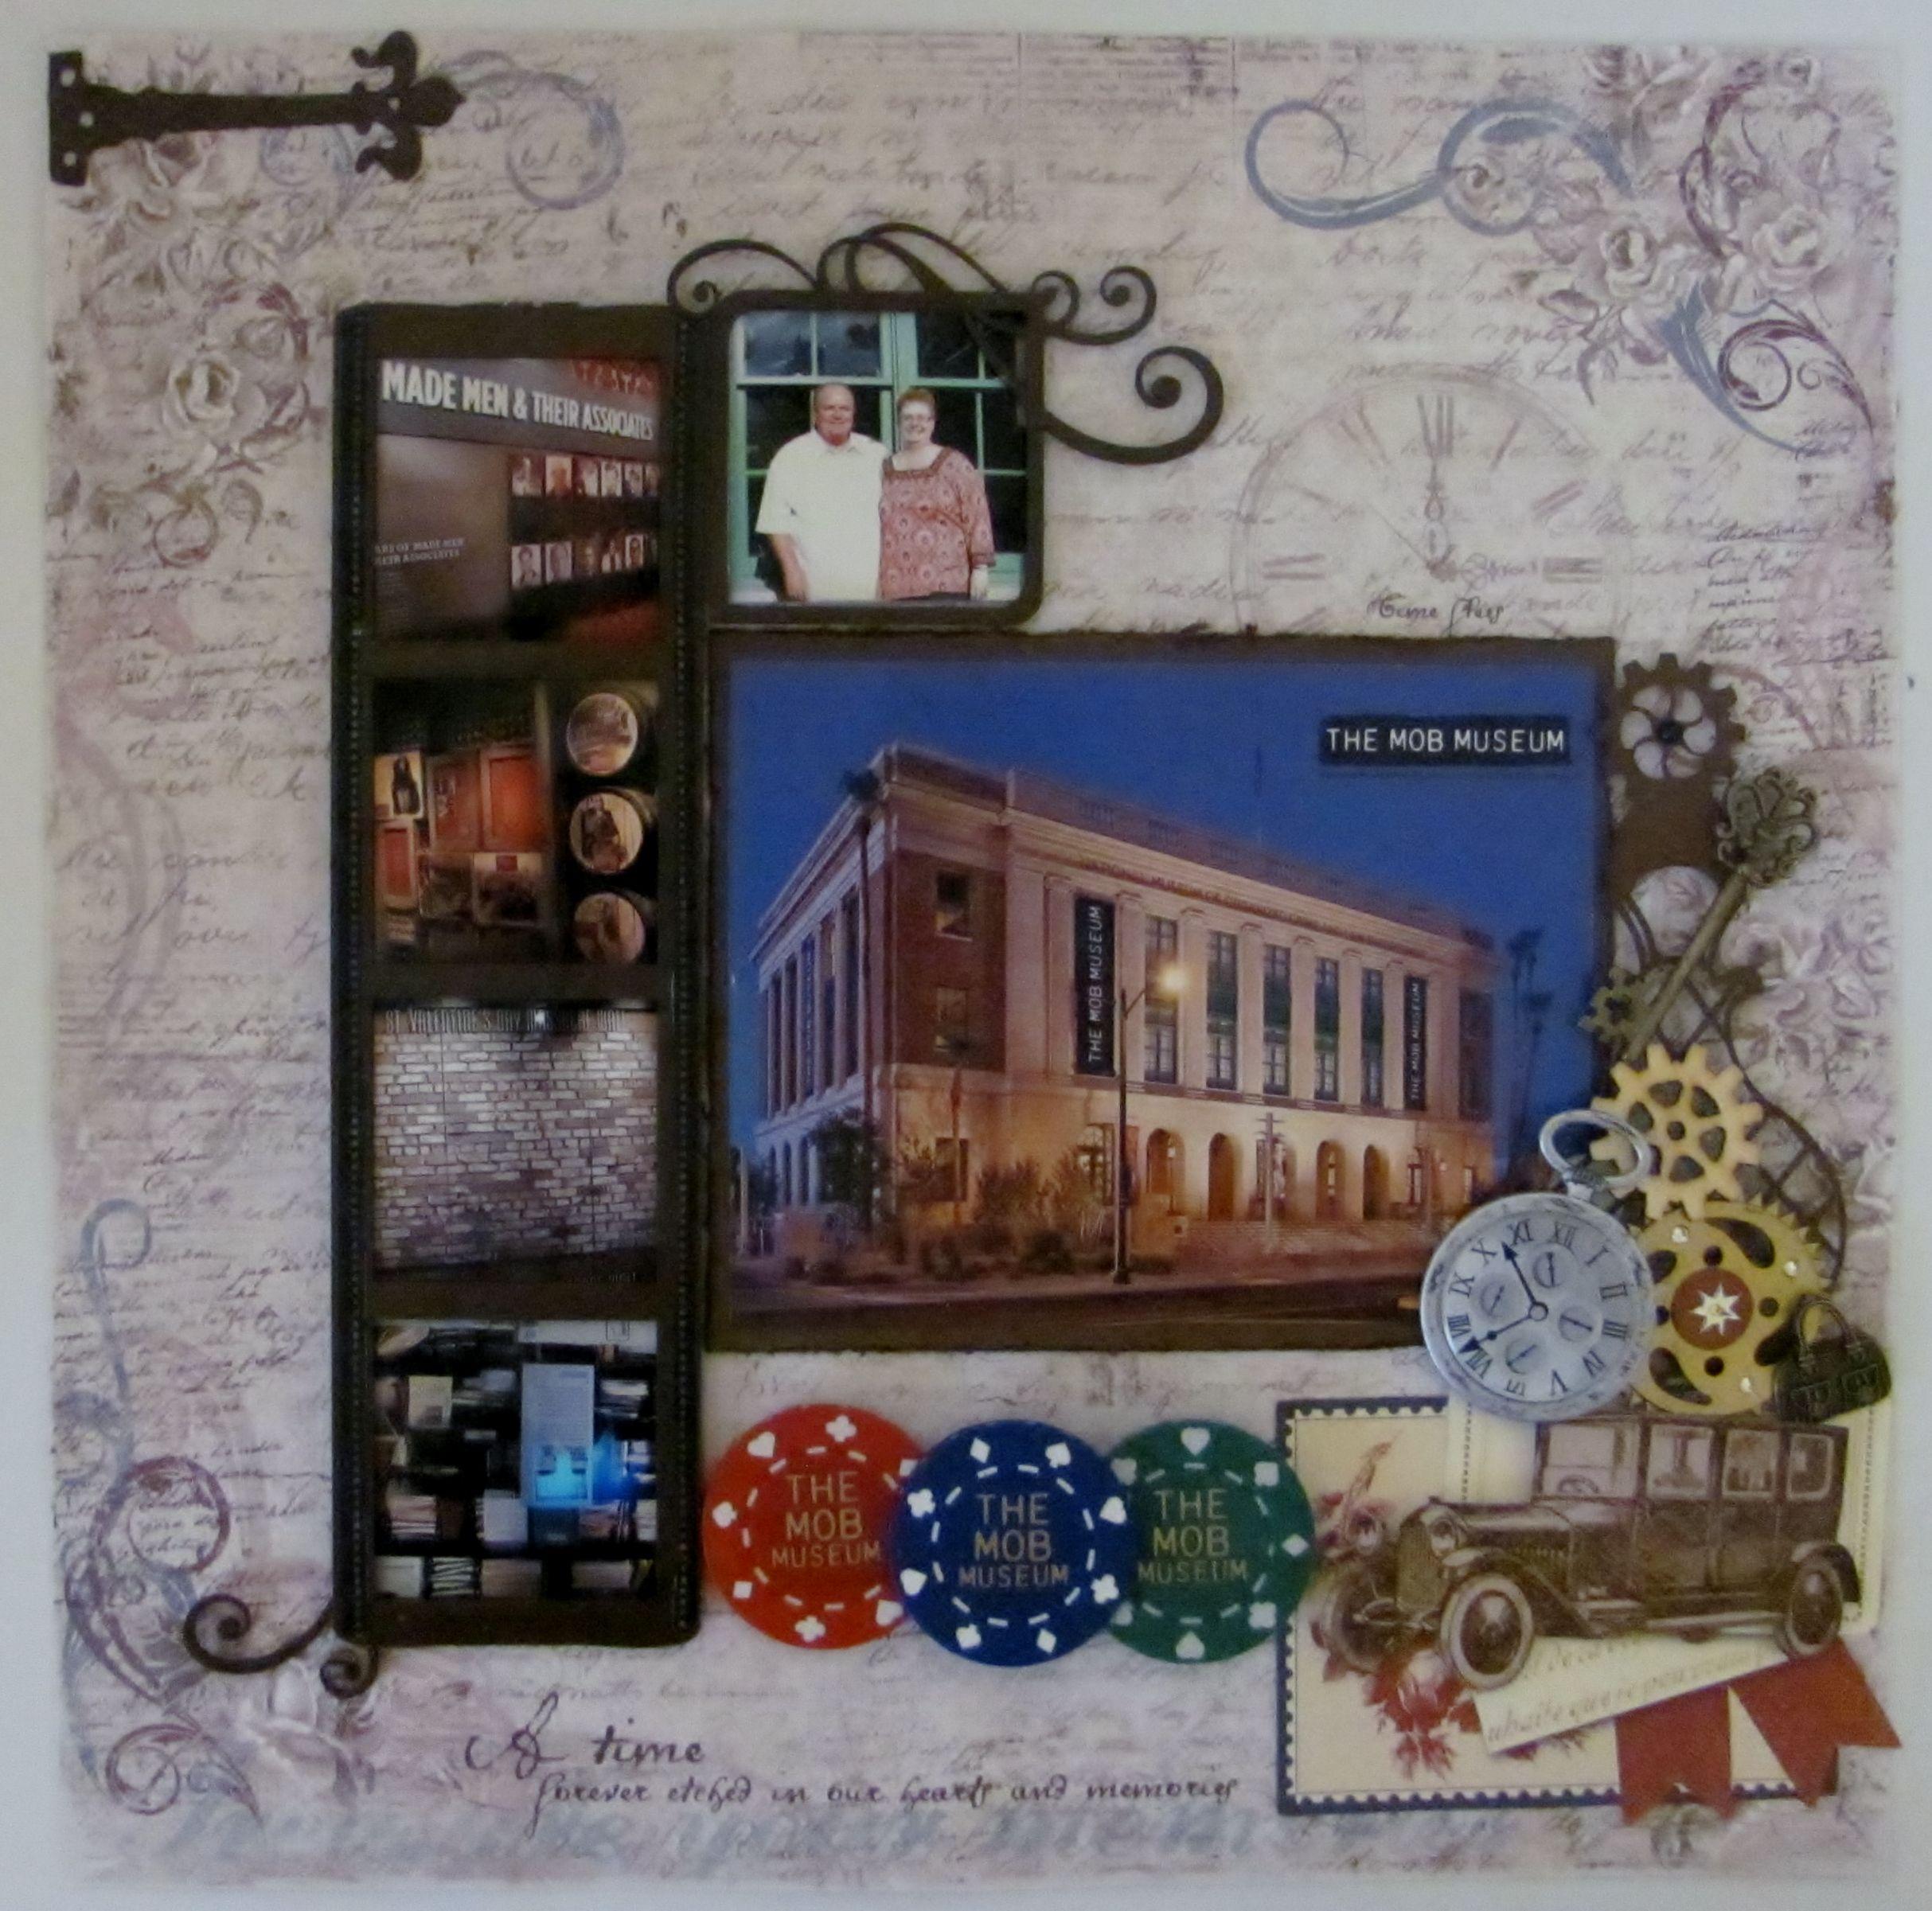 Future Floors Las Vegas: Las Vegas - Mob Museum - Scrapbook.com